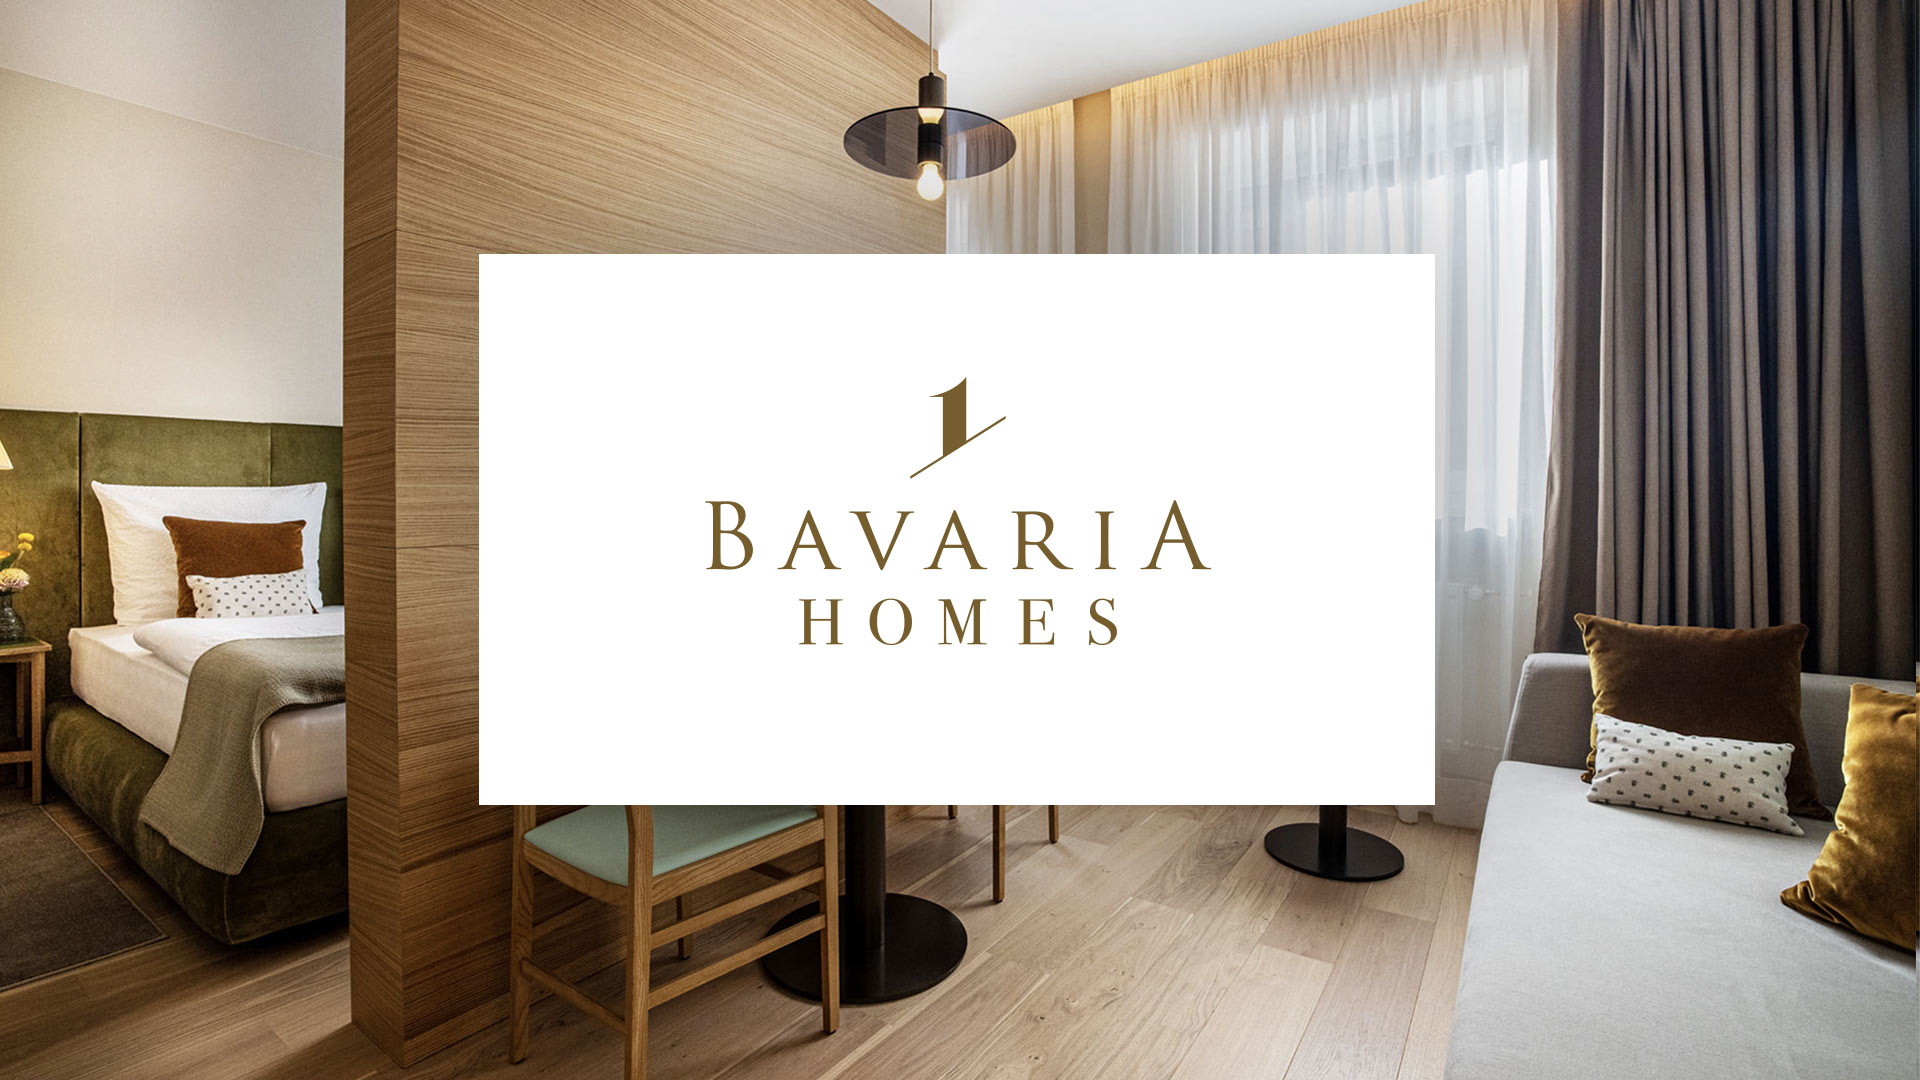 One Bavaria Homes